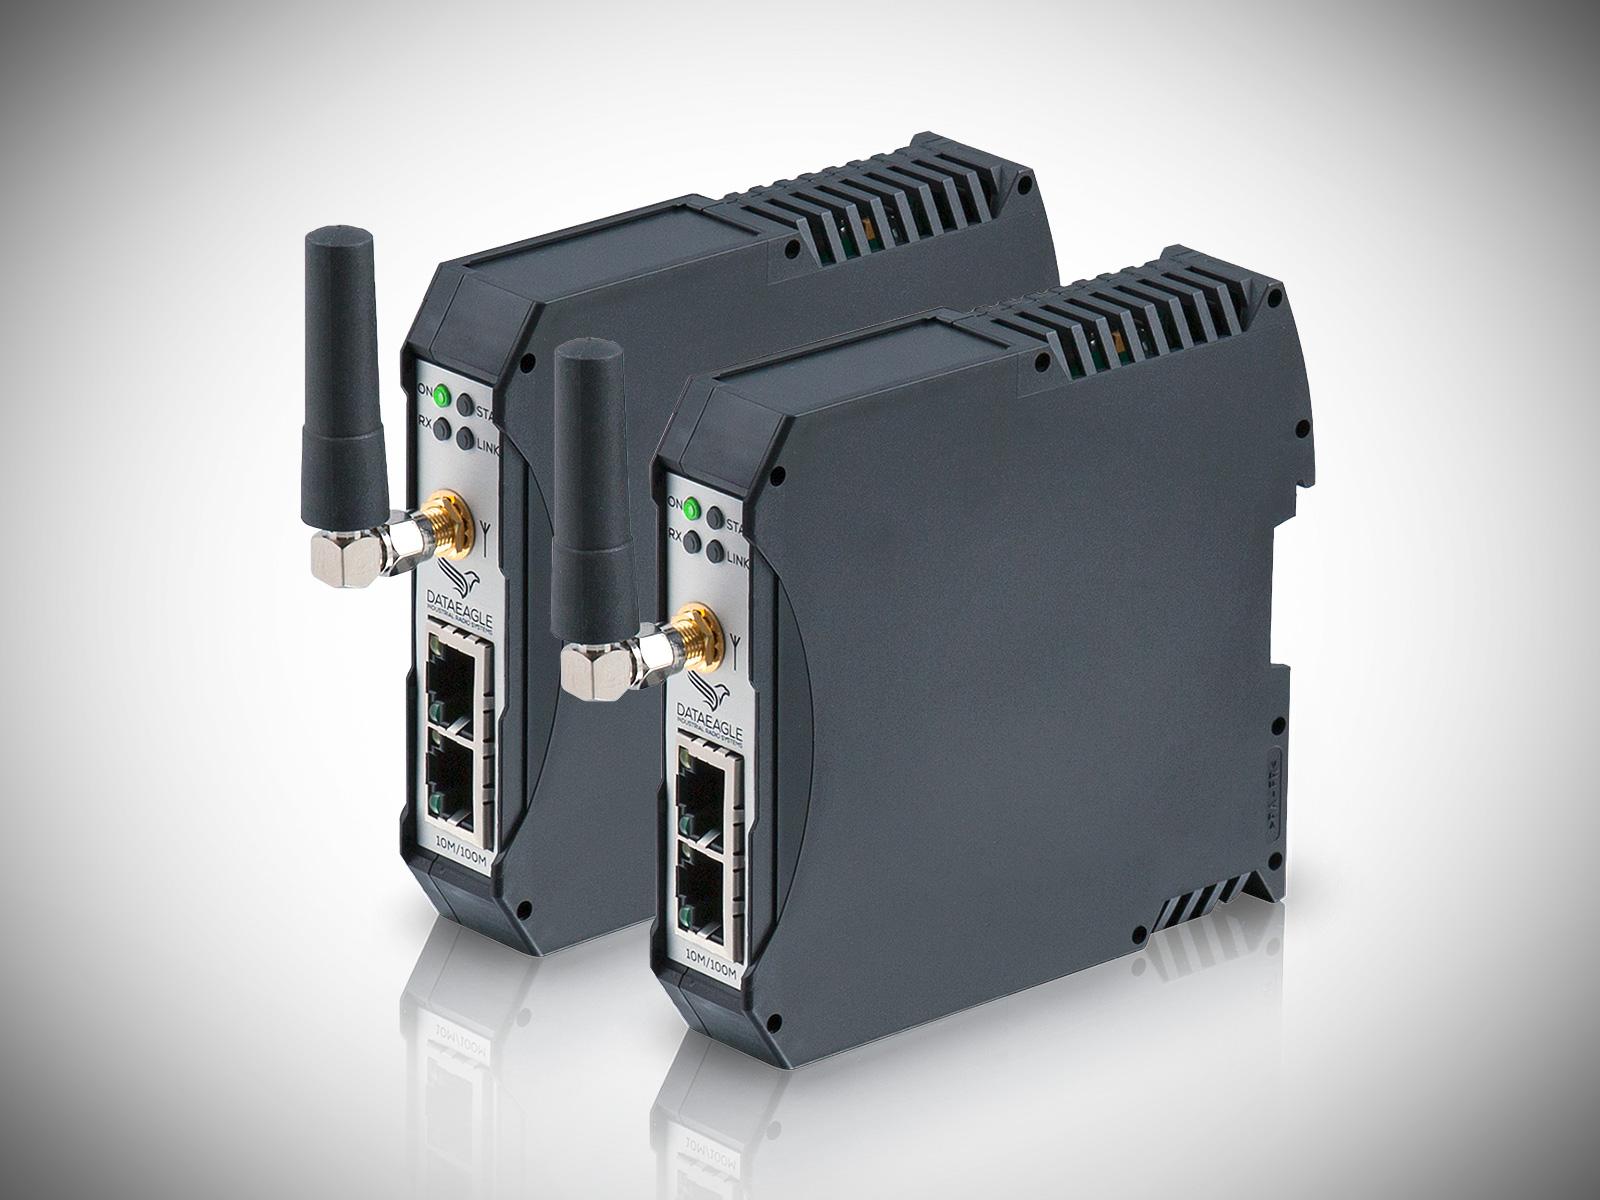 Wireless Mesh-Netzwerk • DATAEAGLE compact 2M10